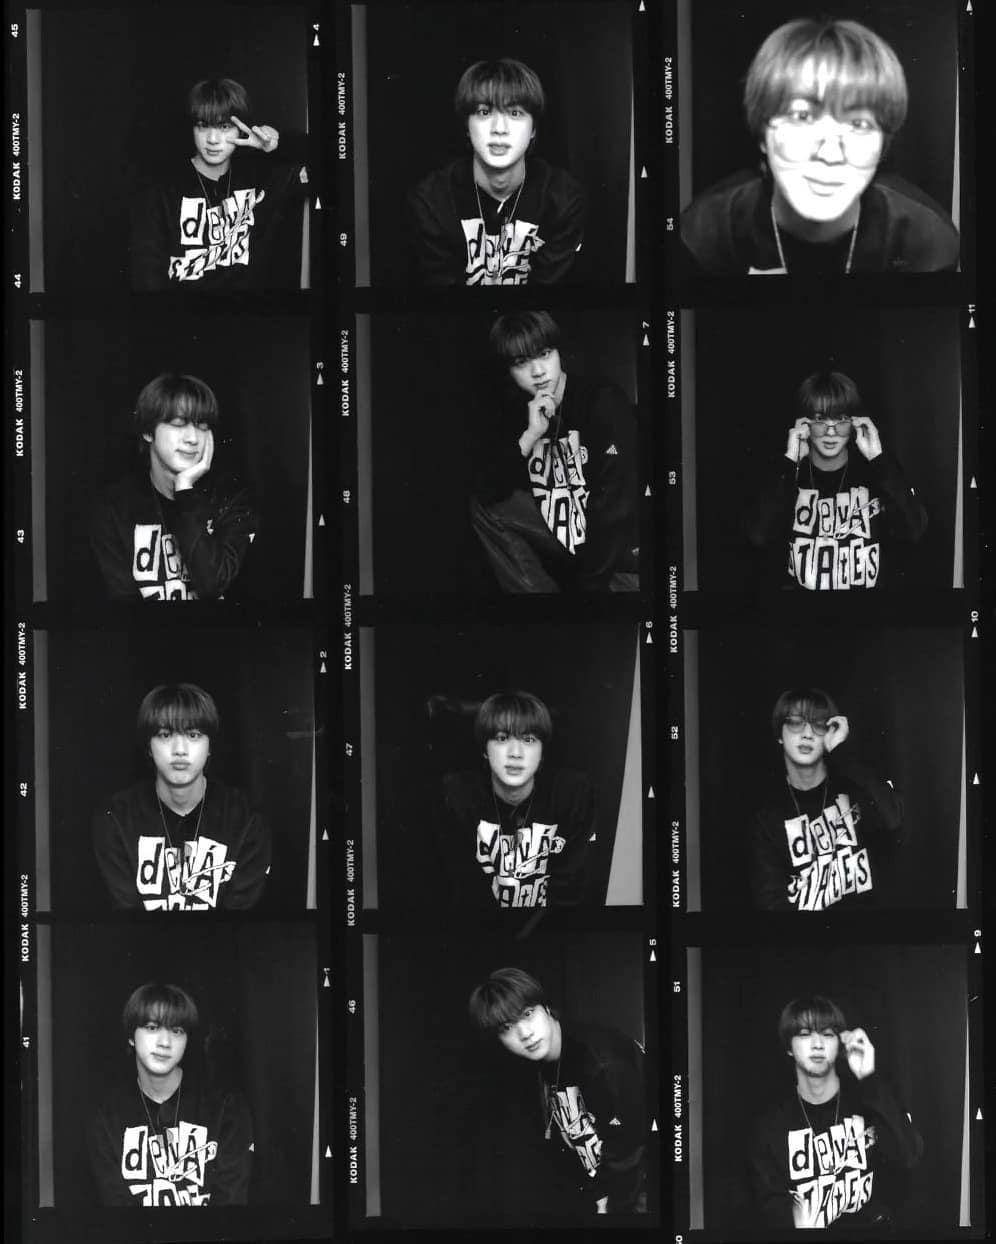 Jin BTS Ketahuan Pakai Baju Milik Brand Indonesia saat Photo Booth